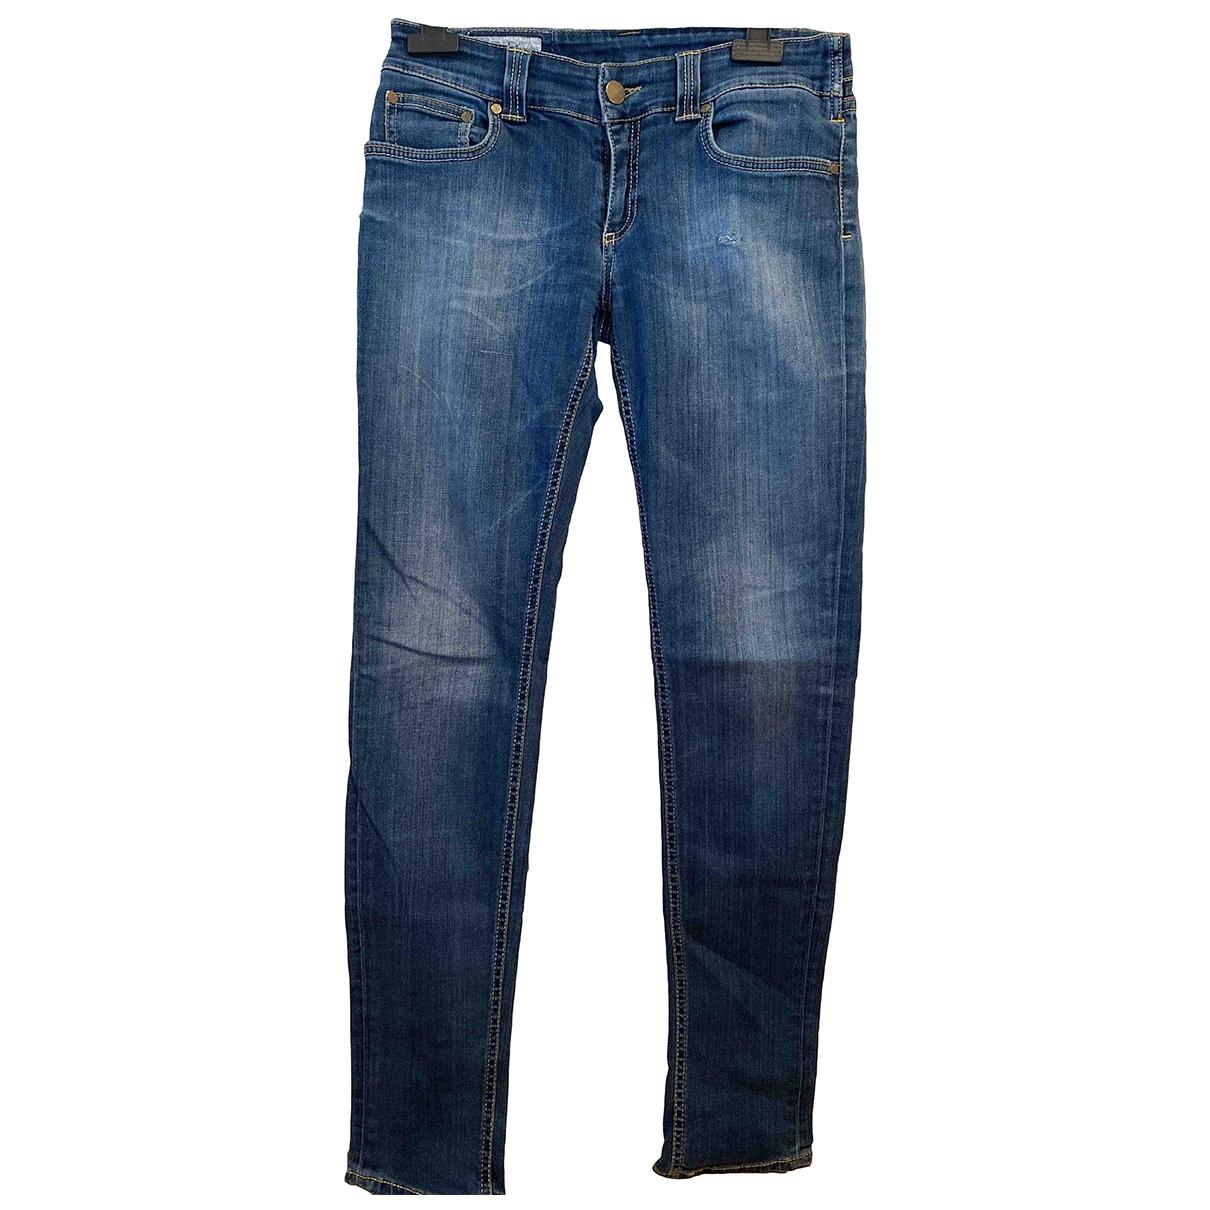 Dondup \N Blue Denim - Jeans Jeans for Women 28 US